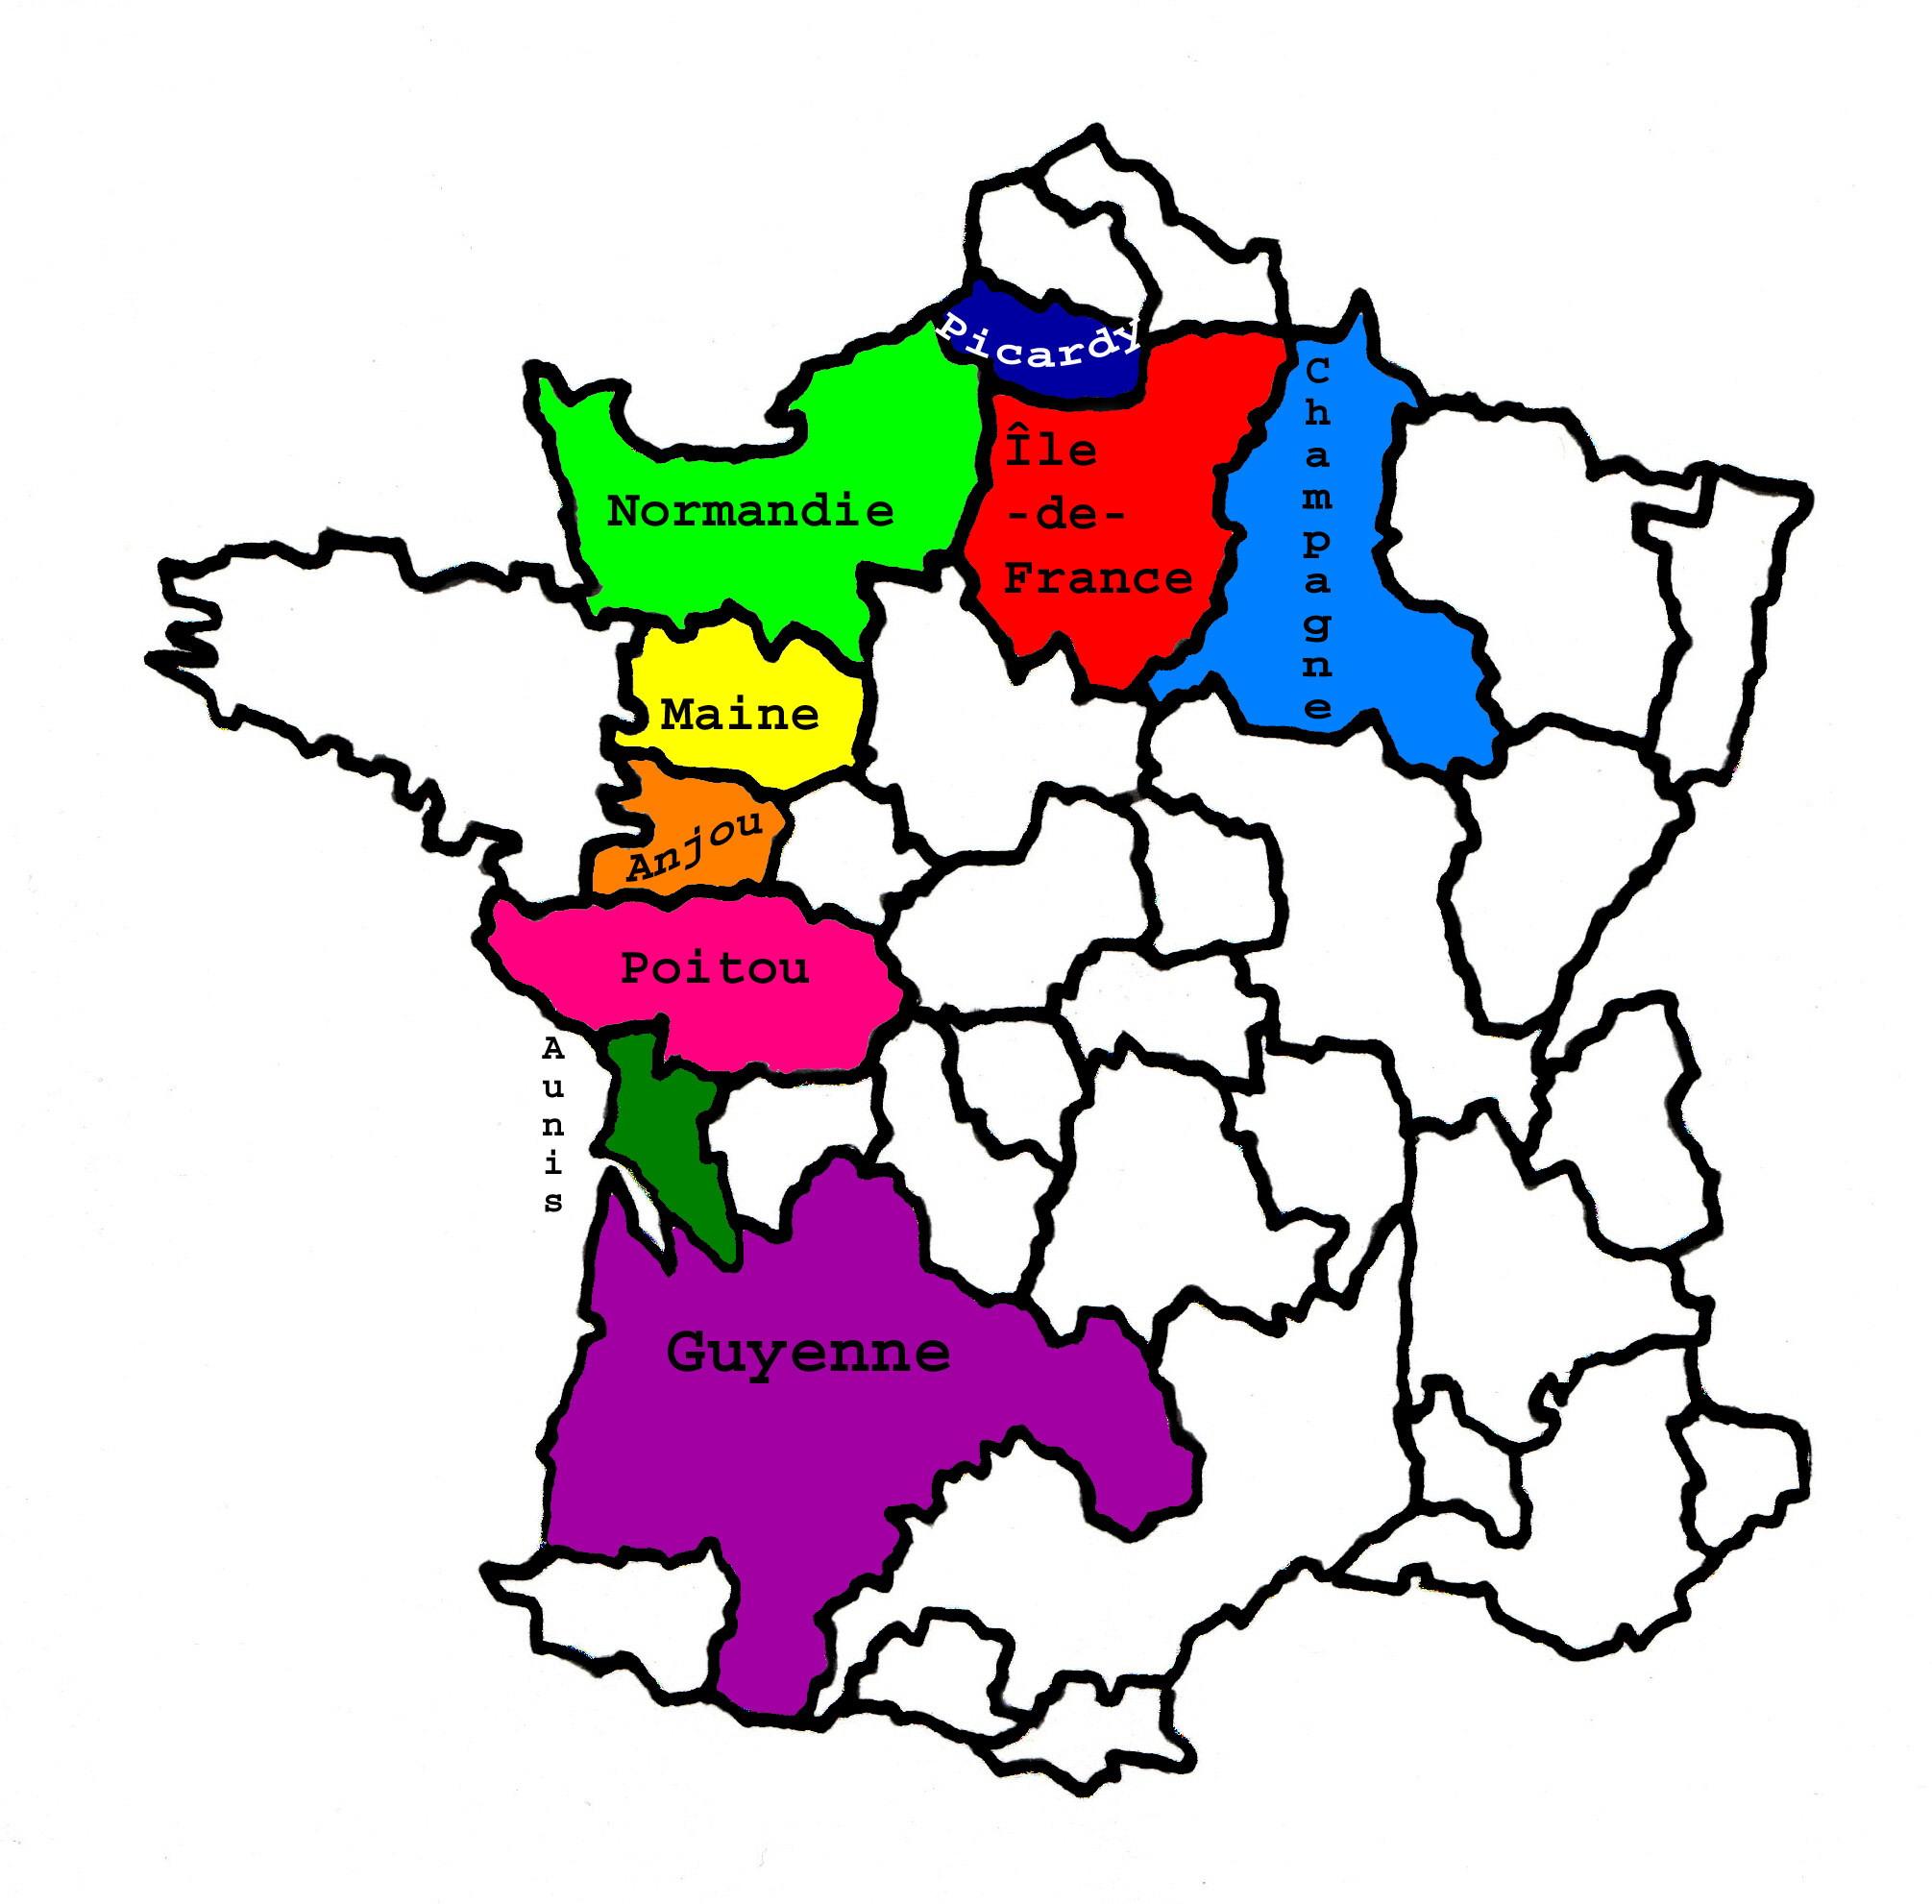 Pierre Goguet Goyet